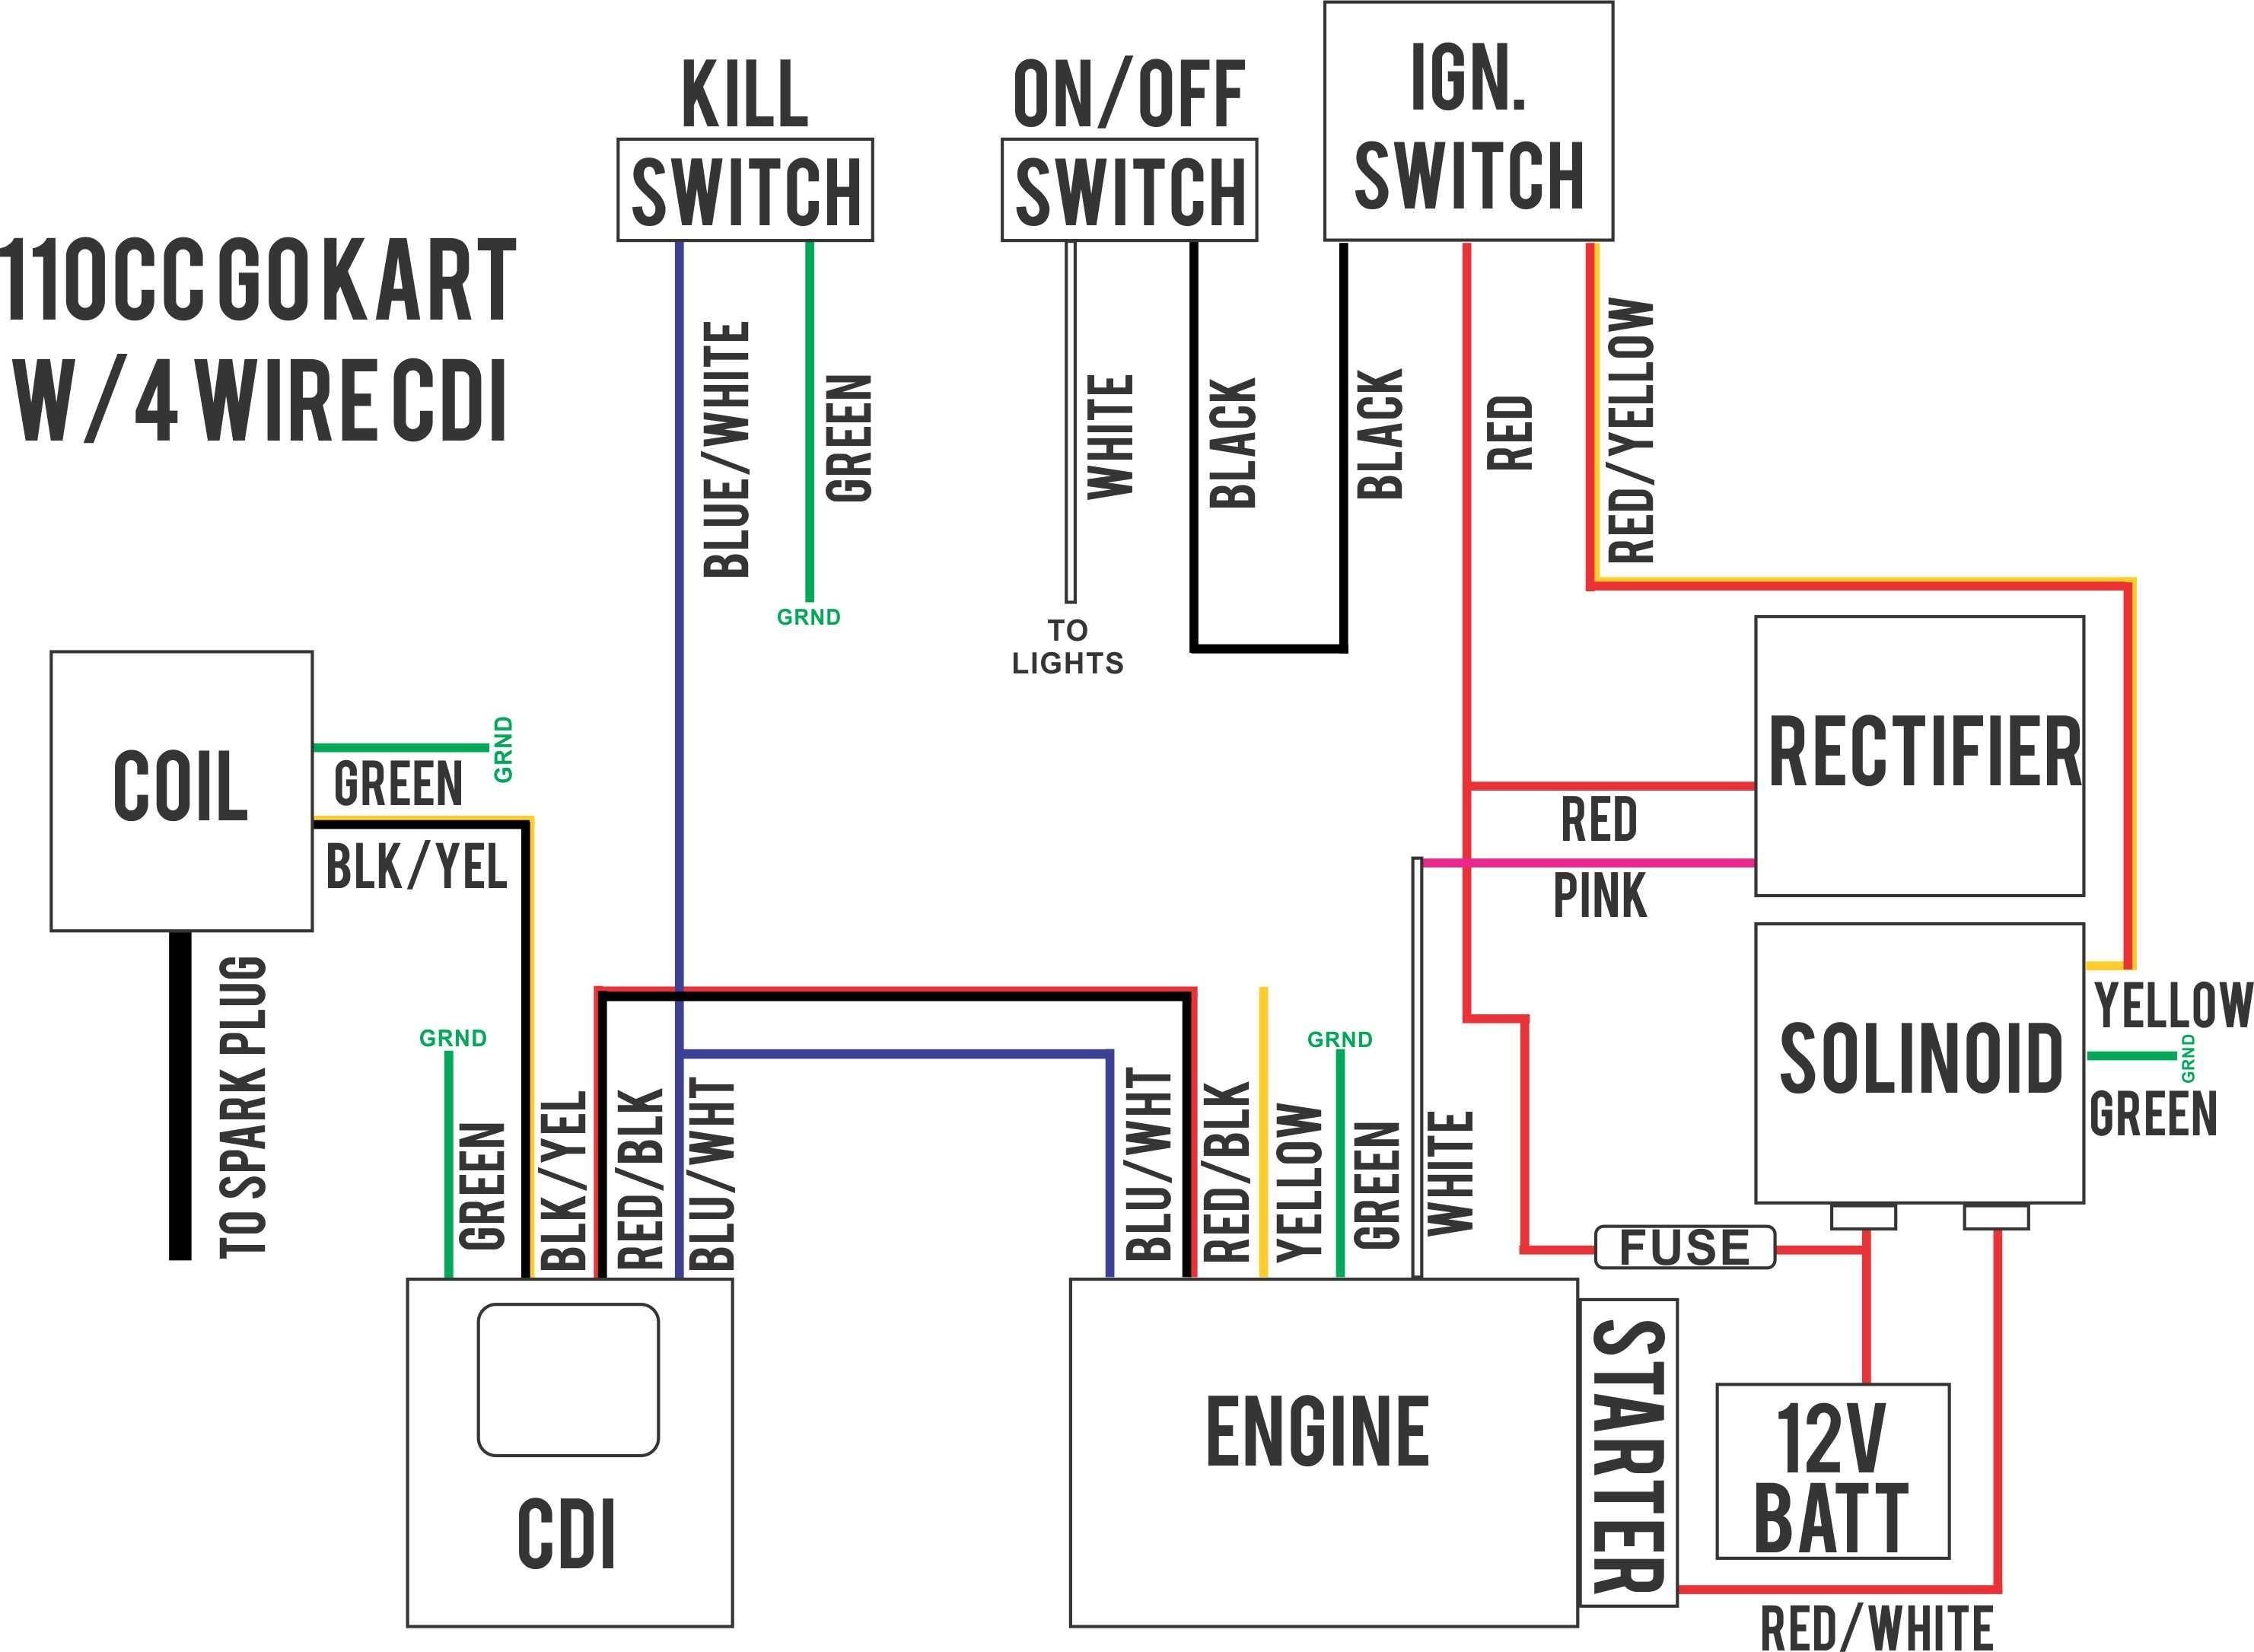 honda wiring diagram motorcycle today diagram database  cd 70 motorcycle wiring diagram #11